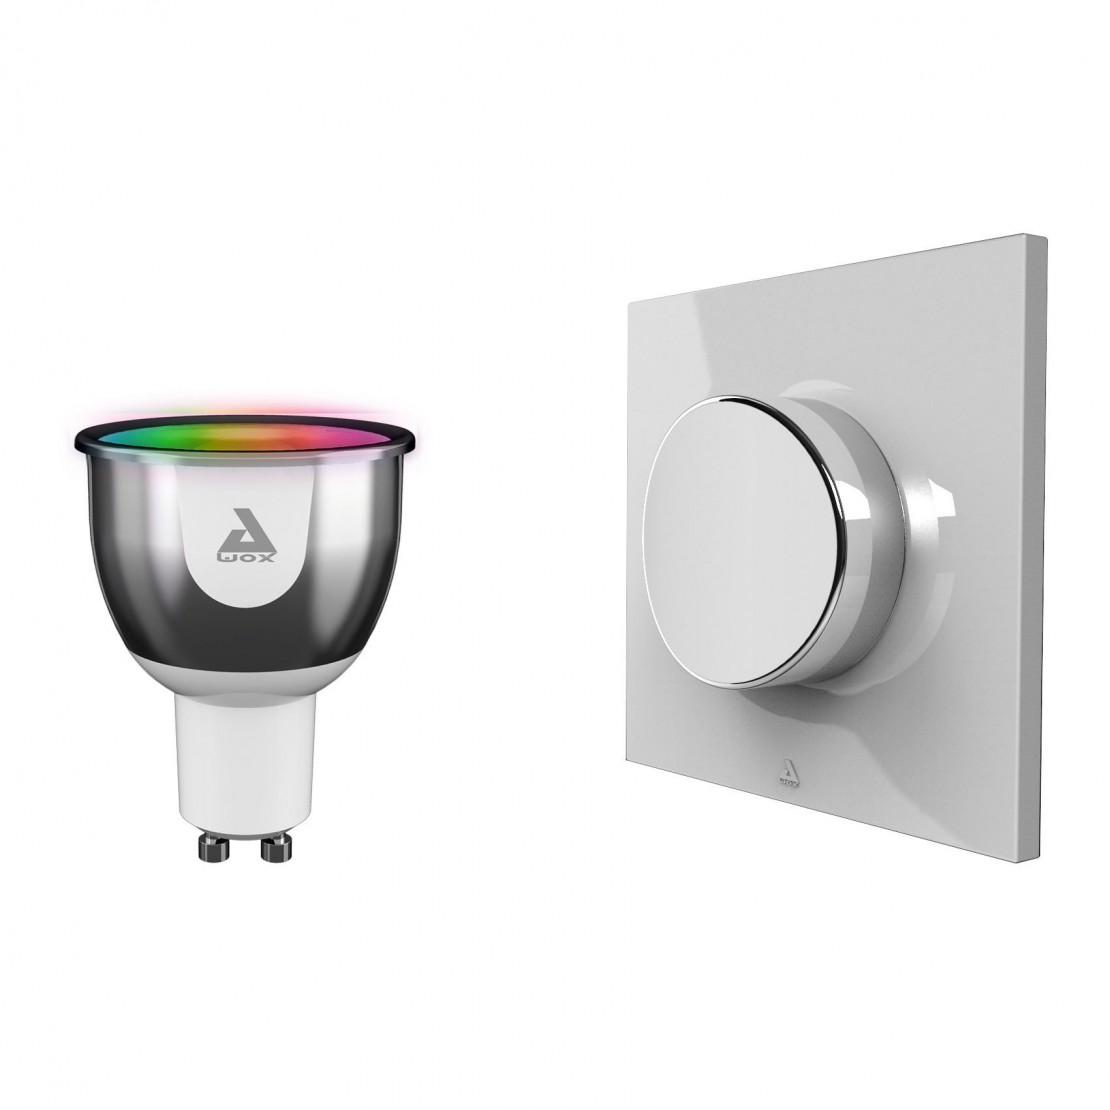 Conjunto de lâmpadas LED GU10 de cor, Bluetooth e interruptor sem fios